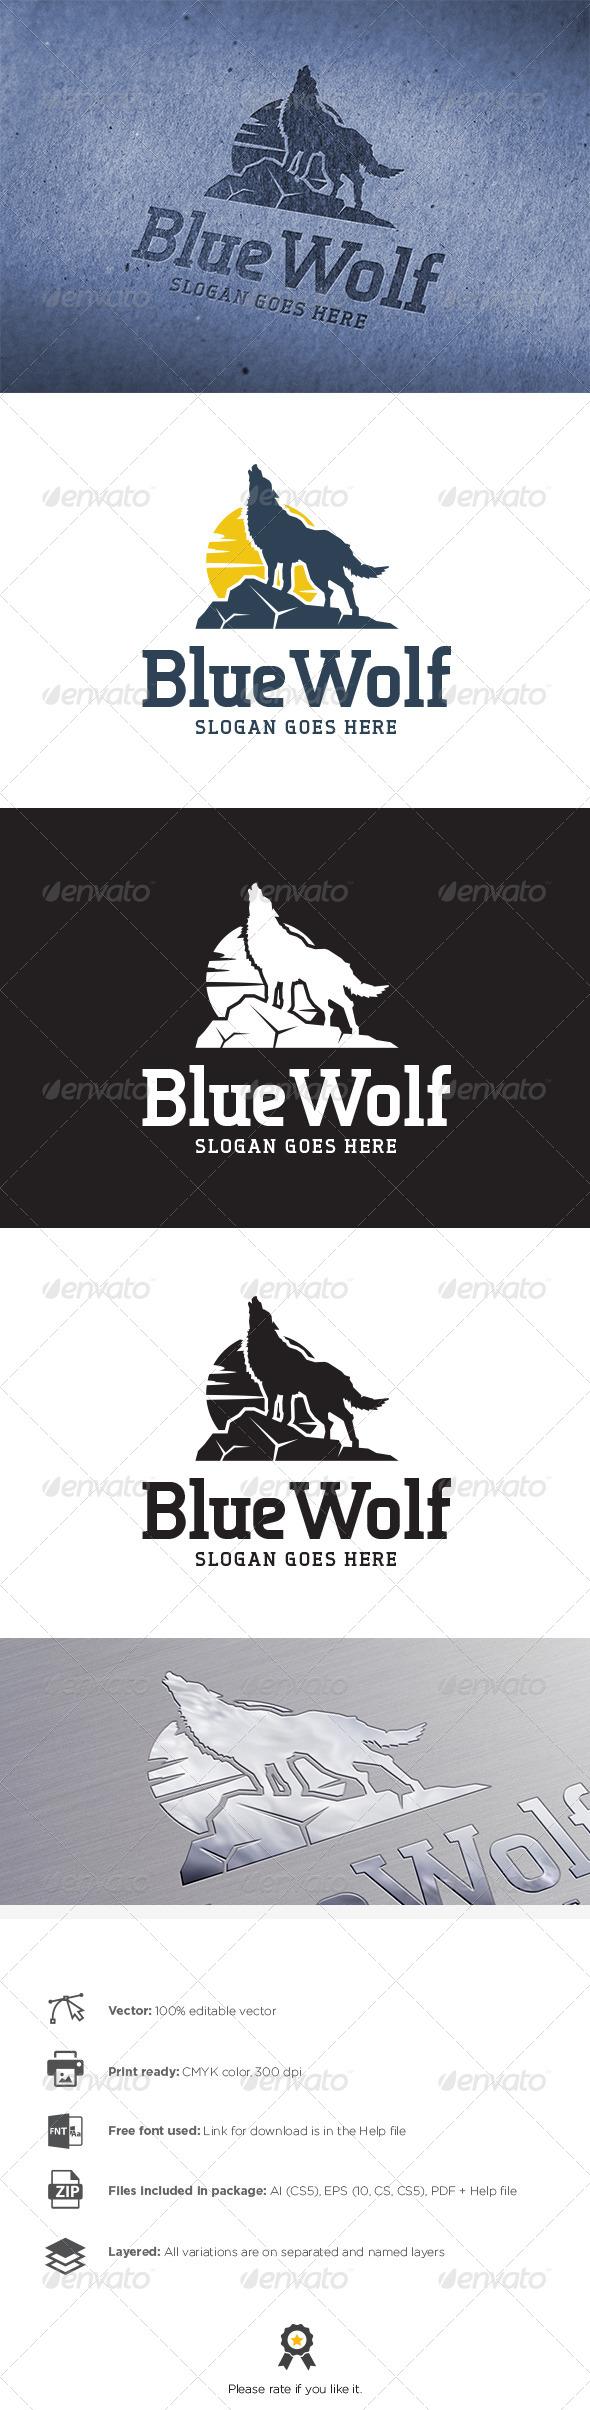 GraphicRiver Blue Wolf Logo 8130246